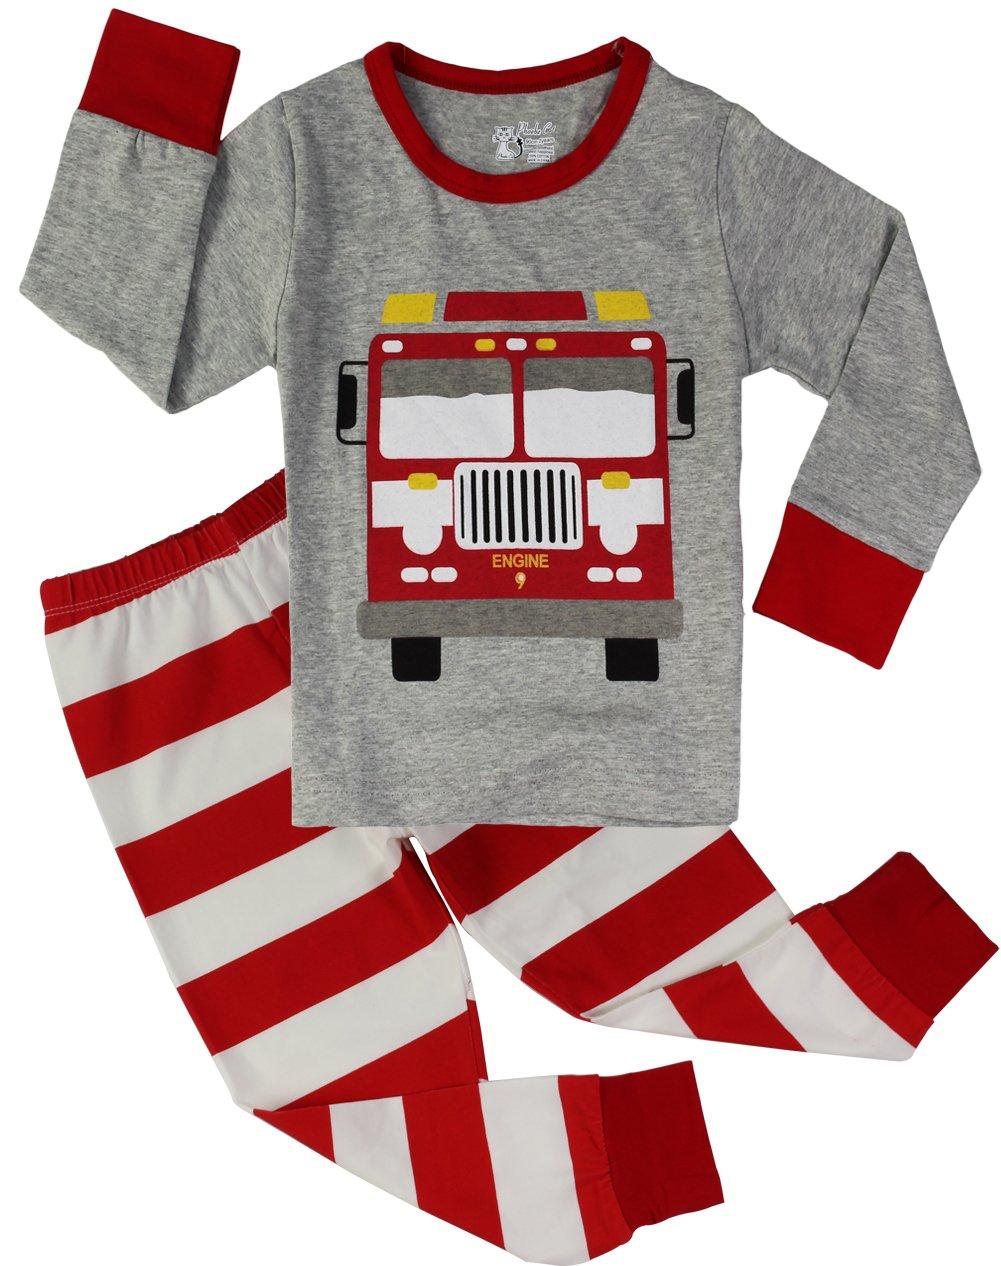 Truck Boys Pajamas Toddler Sleepwear Clothes T Shirt Pants Set for Kids